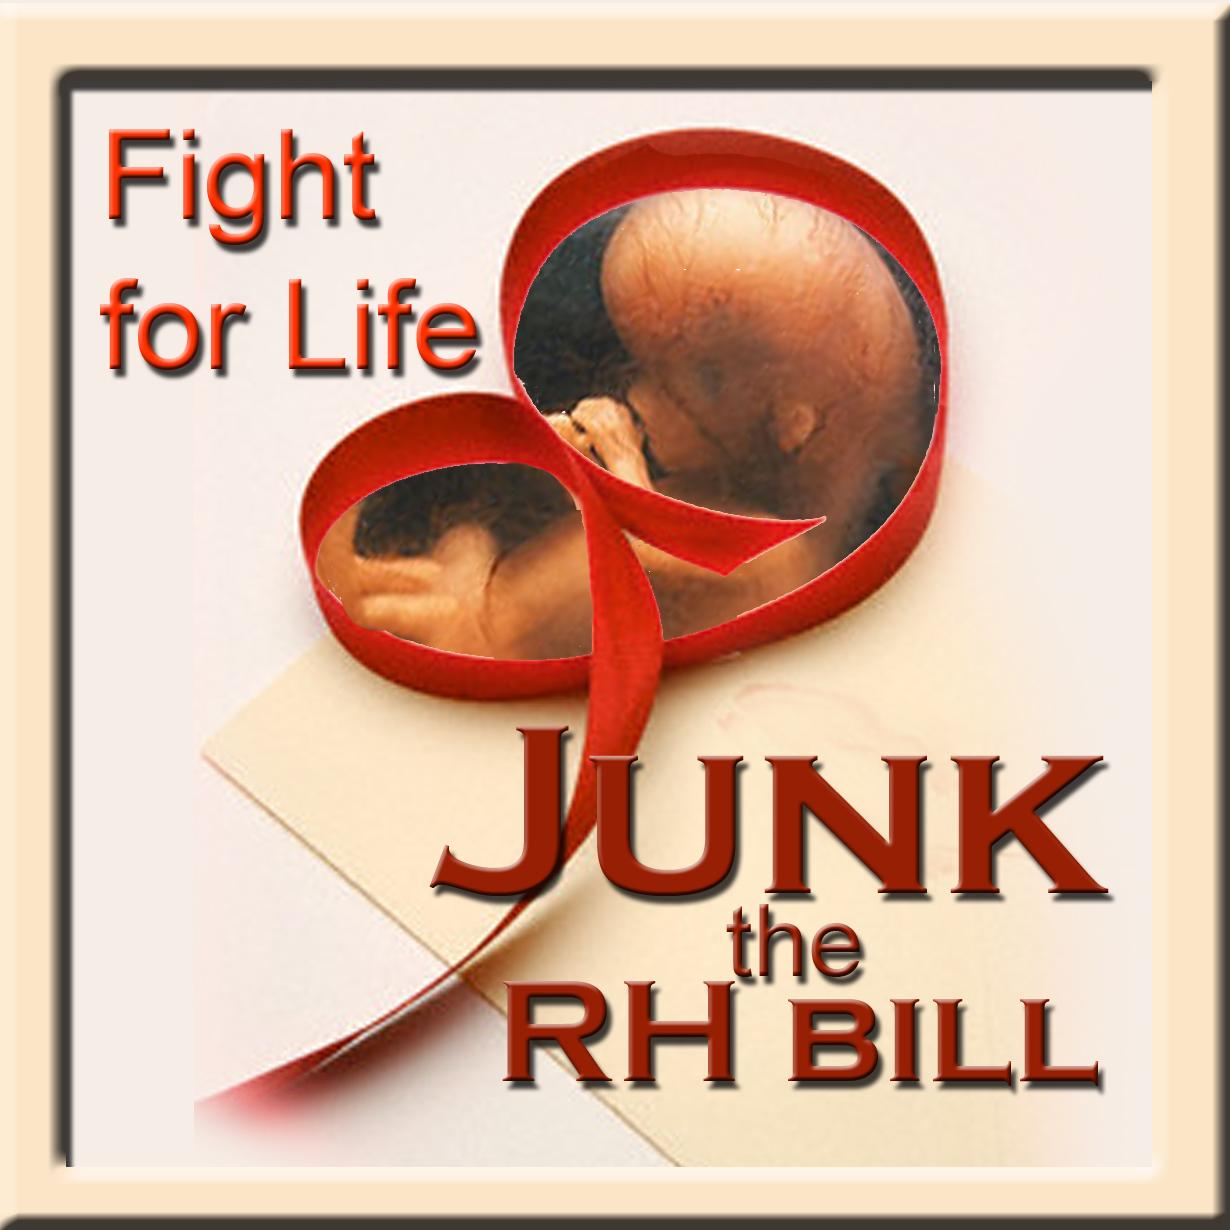 Why No to RH Bill?